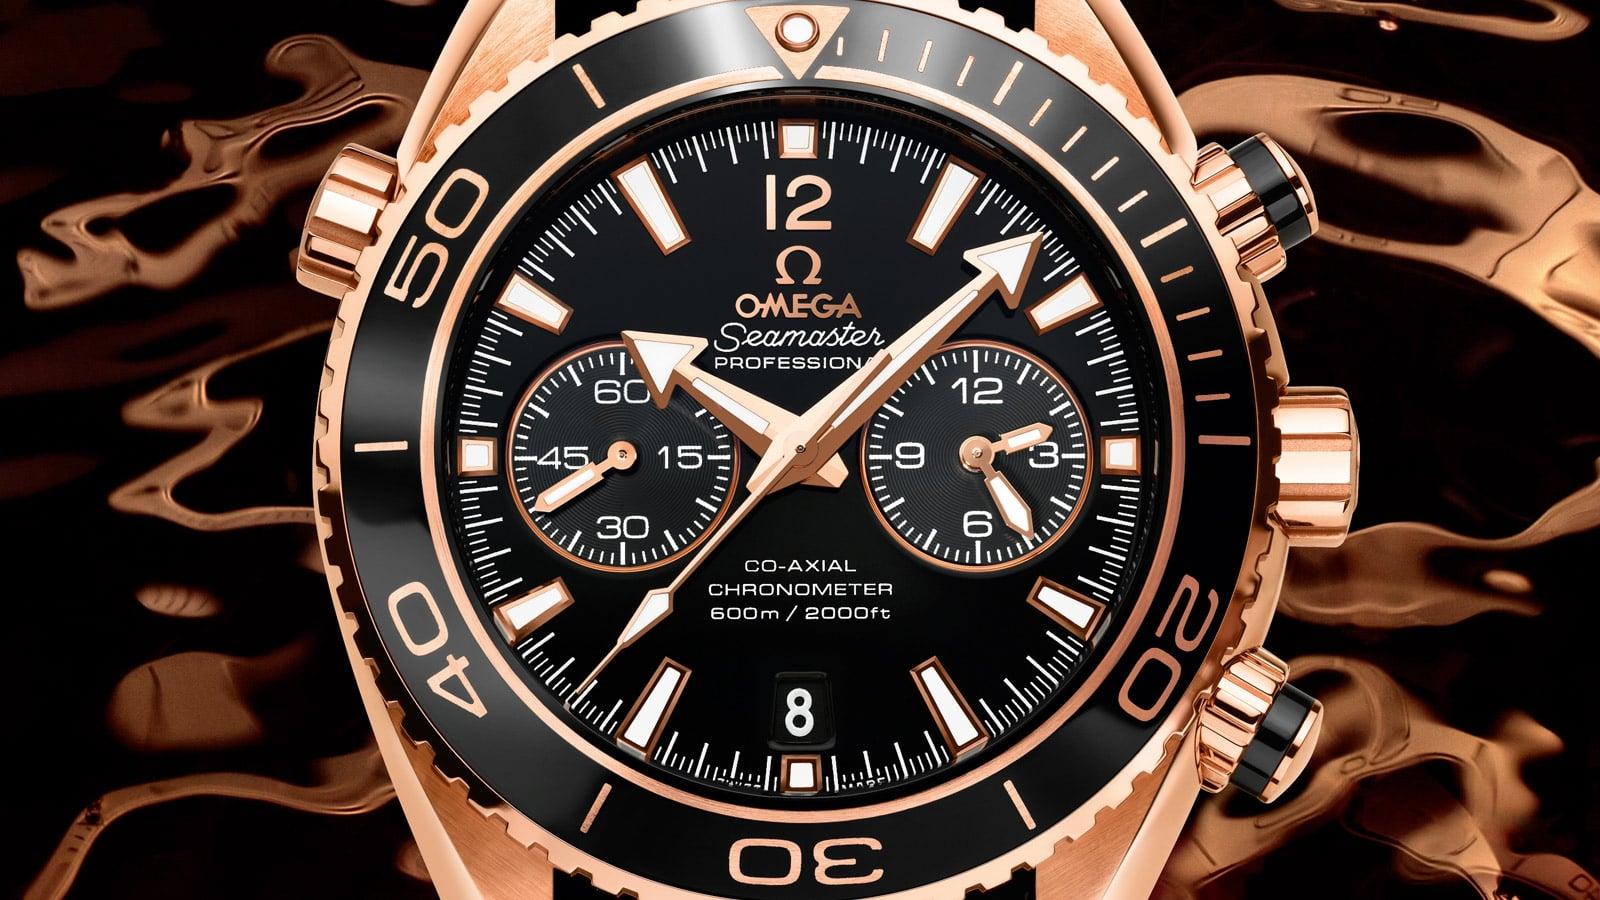 欧米茄Ceragold腕表: Seamaster - 海洋宇宙600米腕表 - 影片 - 14521